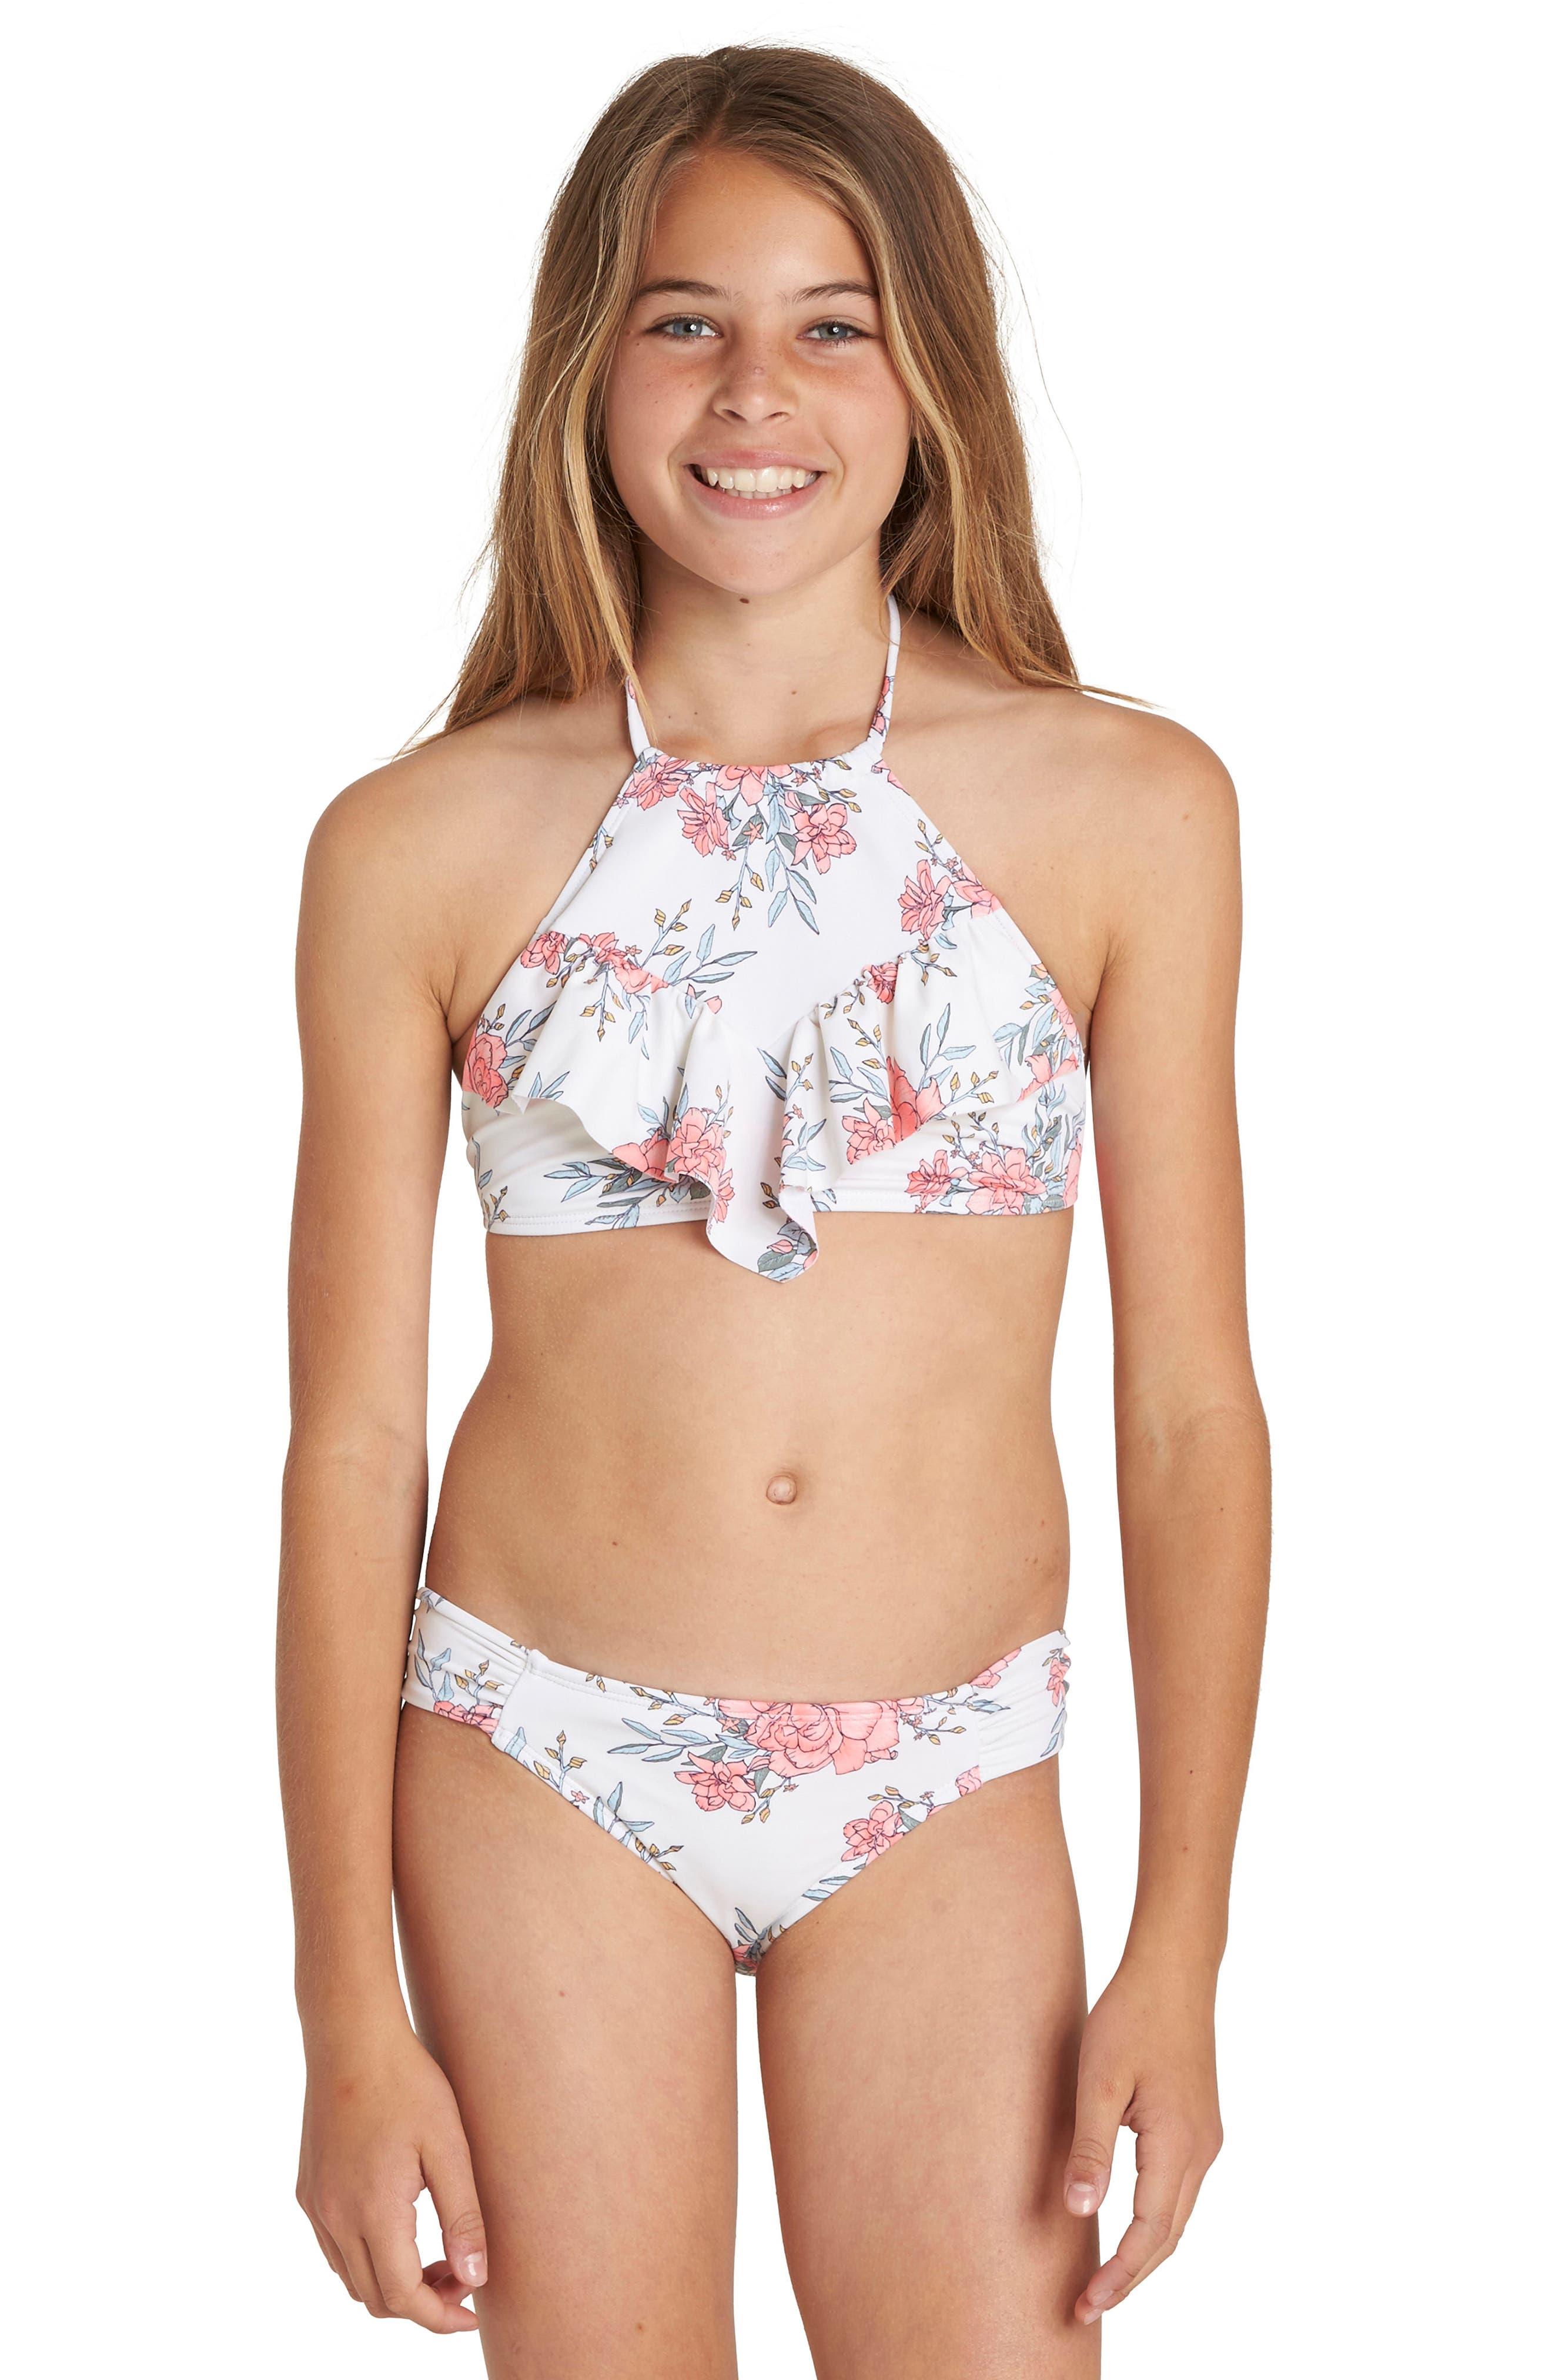 Alternate Image 1 Selected - Billabong Nova Floral Two-Piece Swimsuit (Little Girls & Big Girls)